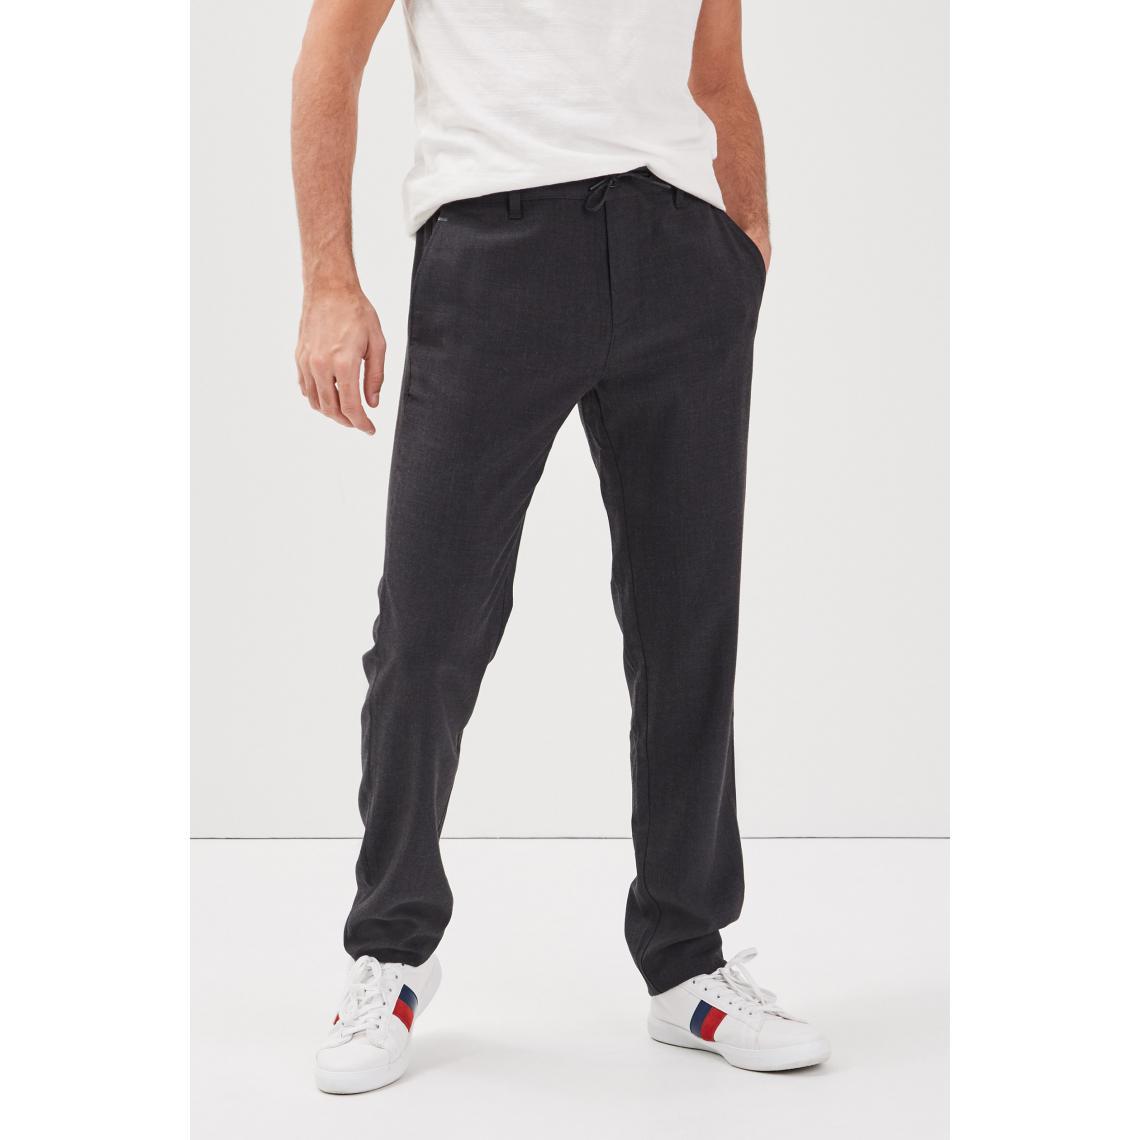 Pantalon chino cordon taille   3 SUISSES